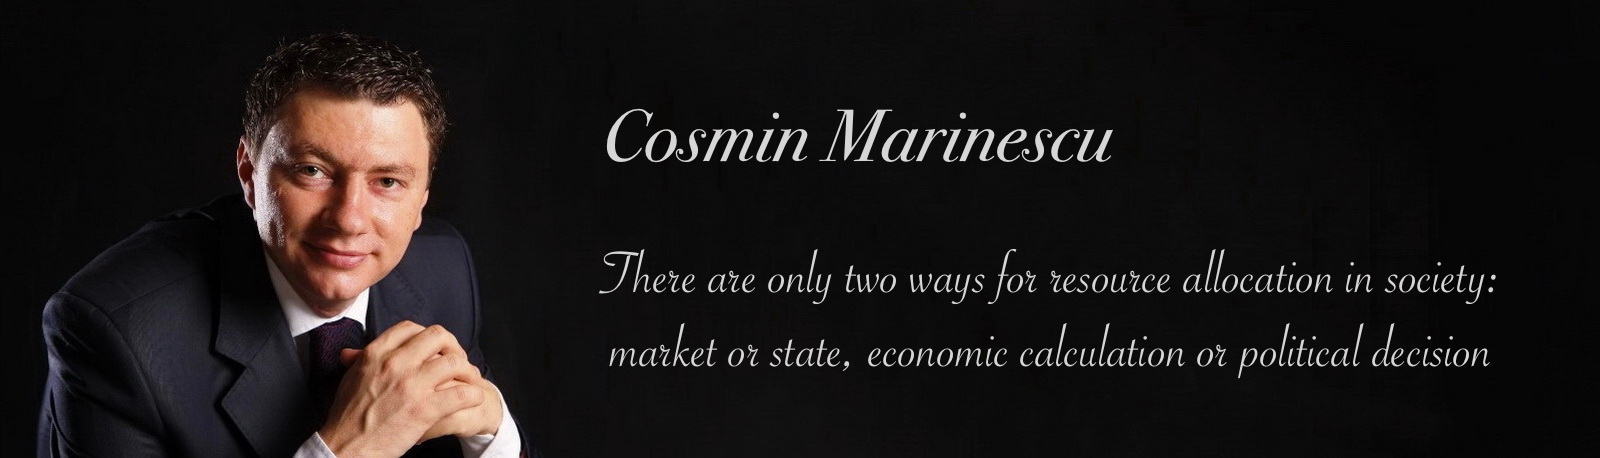 http://en.cosmin-marinescu.ro/wp-content/uploads/2017/10/Slide-6-EN.jpeg